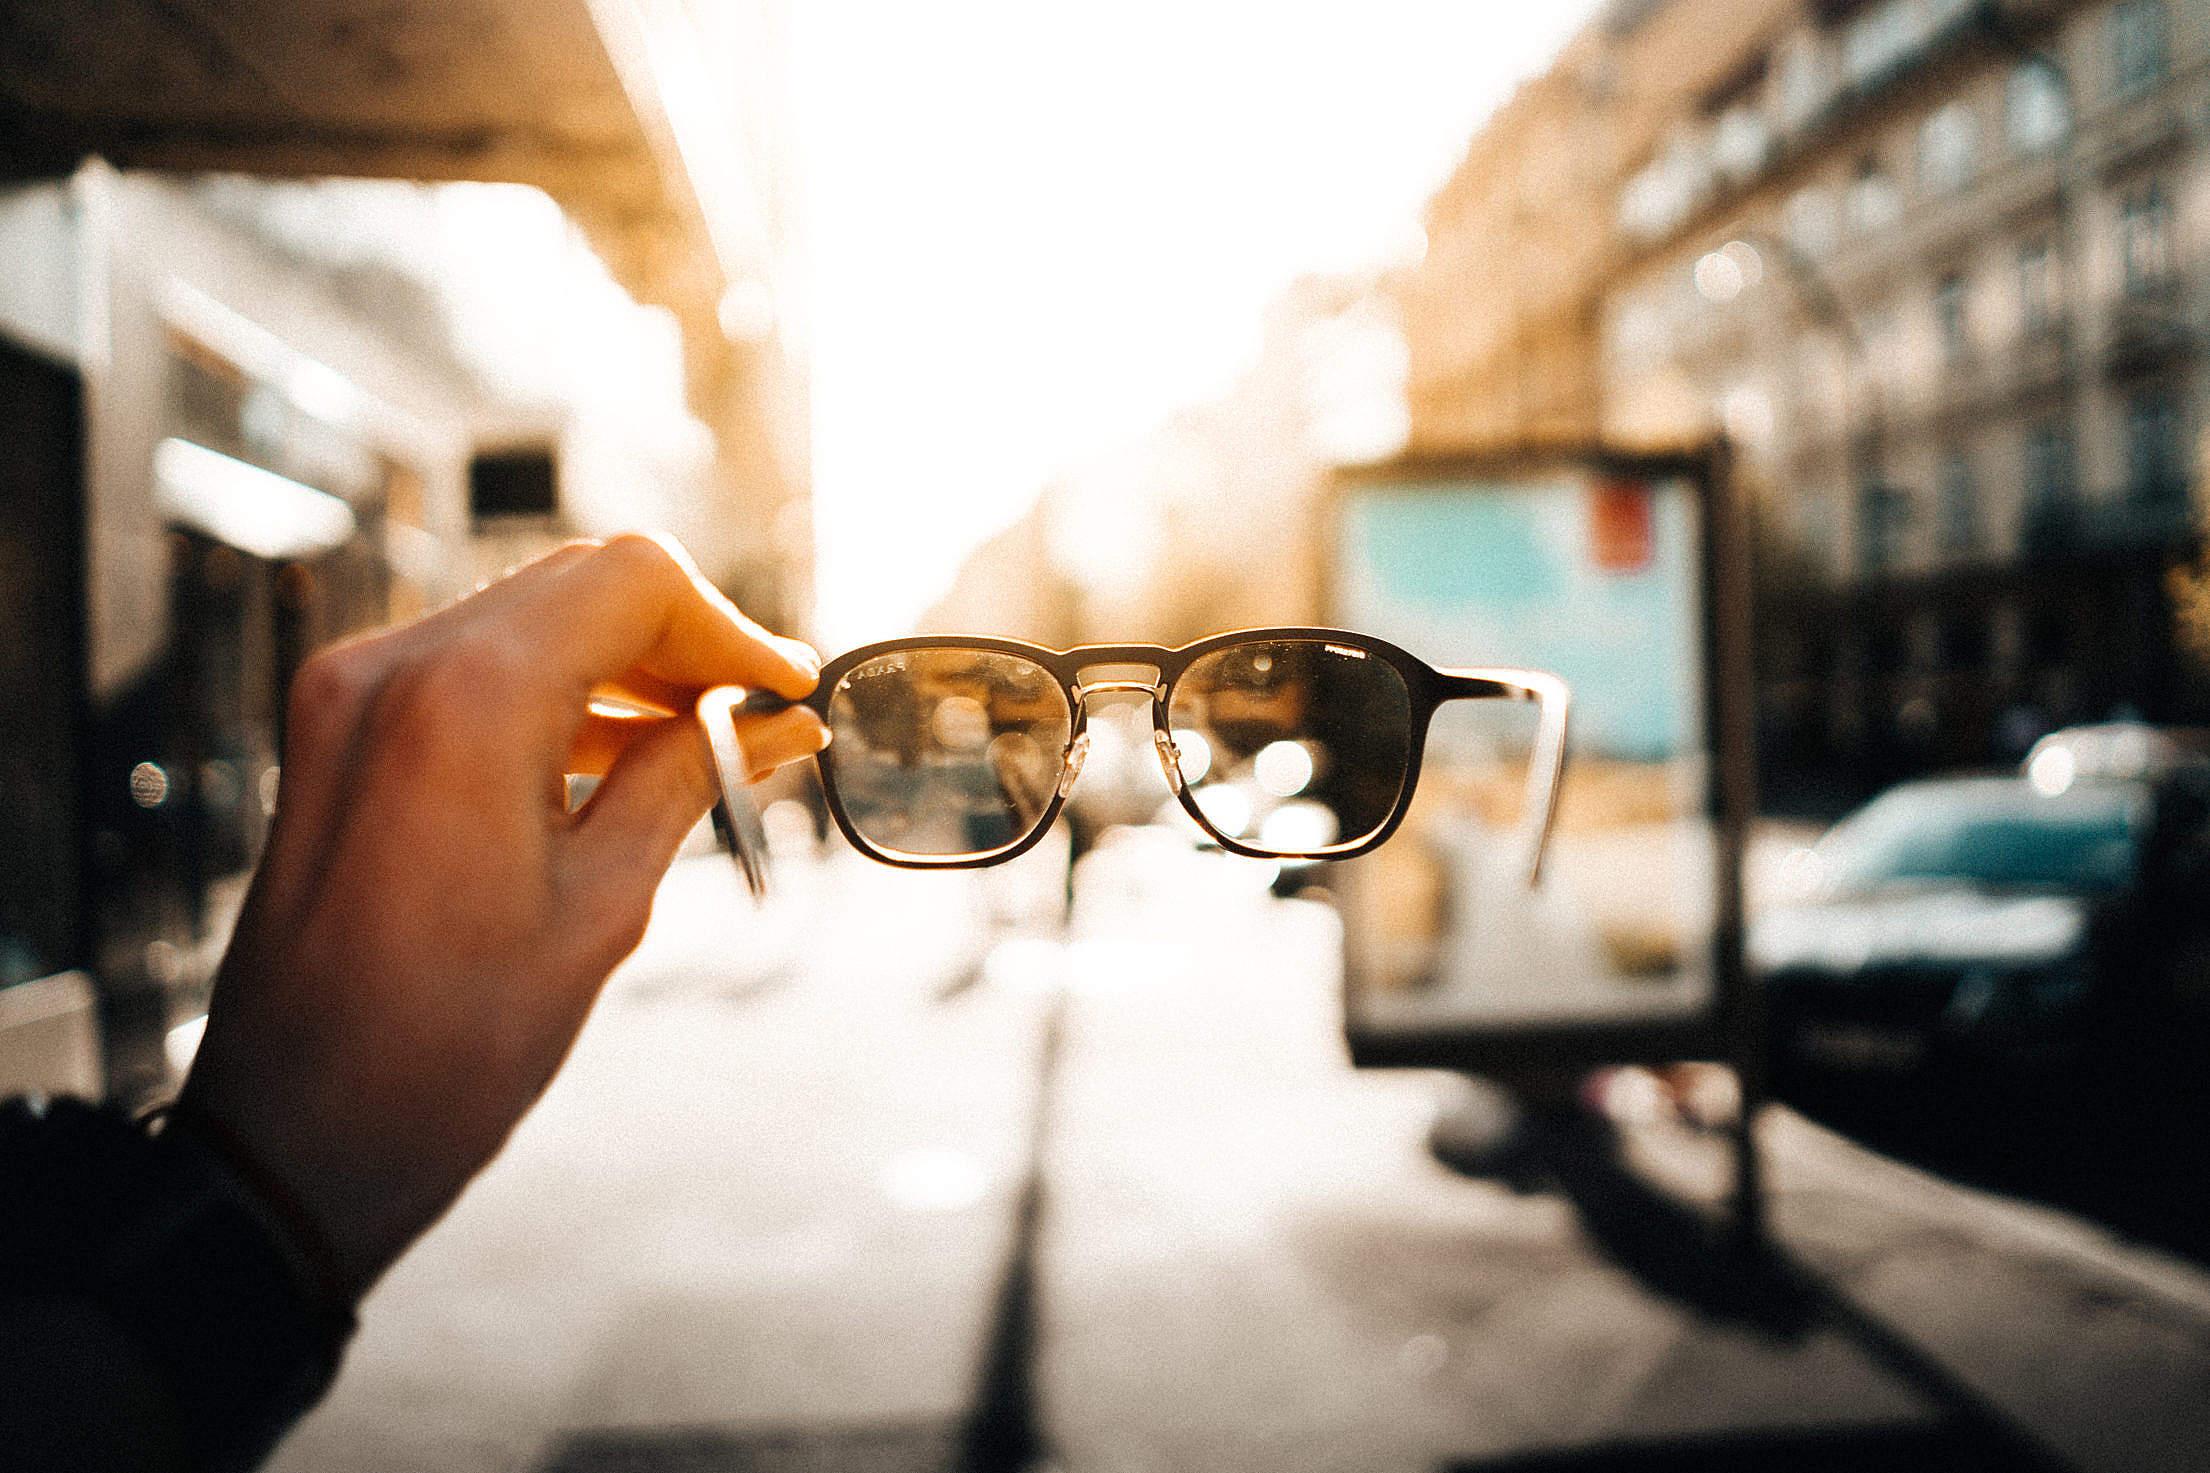 Man Holding Sunglasses Free Stock Photo